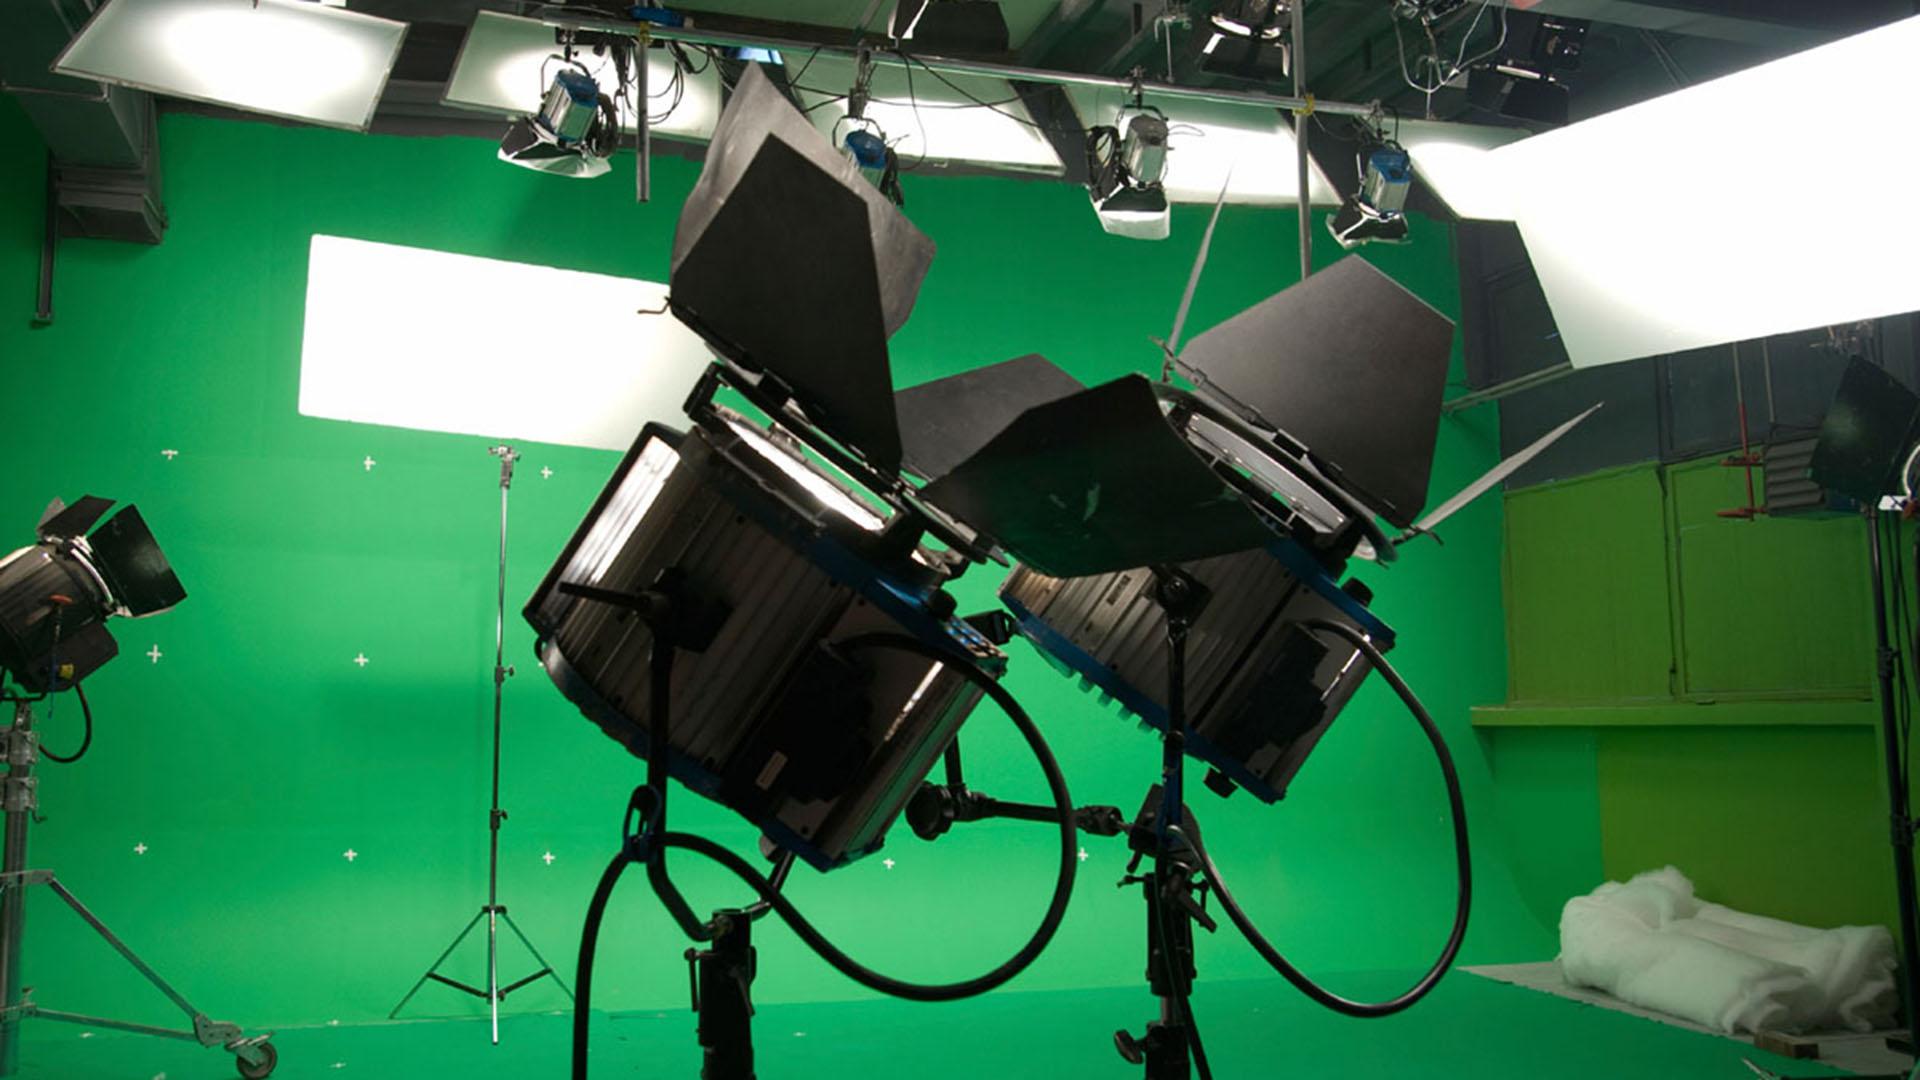 Lighting Green Screen Video/Photography? & Photofocus | Lighting Green Screen Video/Photography? azcodes.com